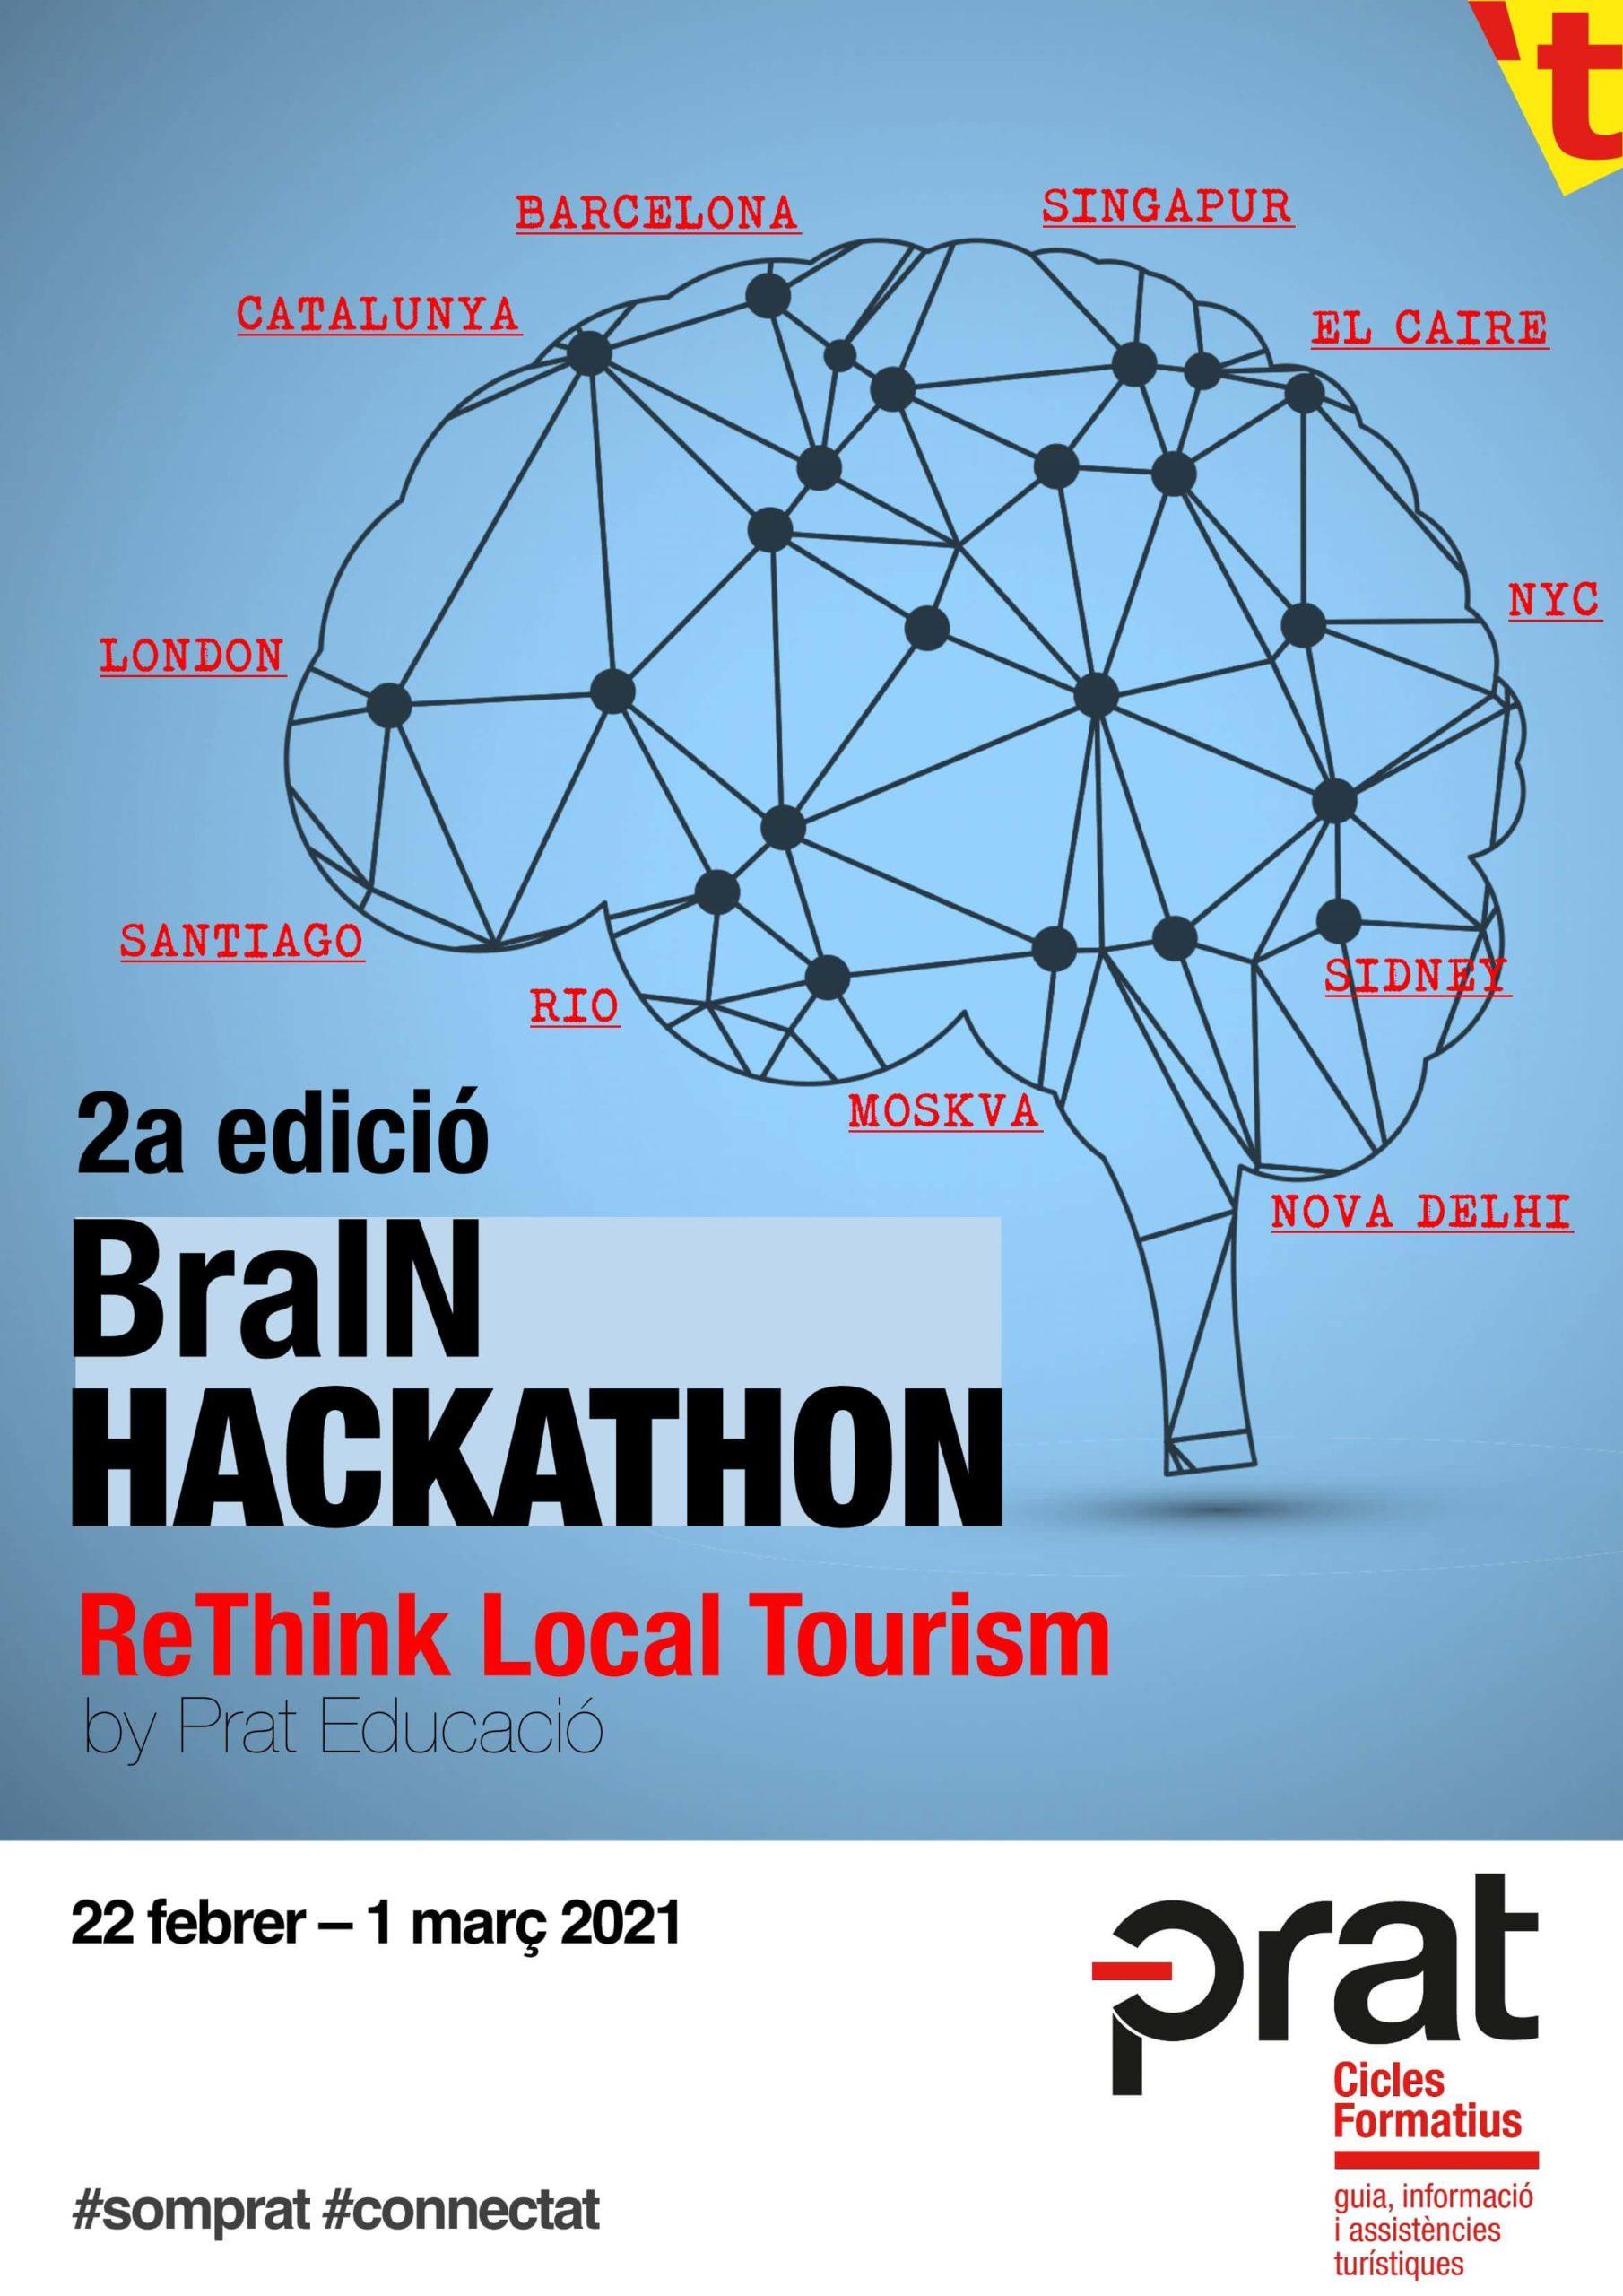 2a edició: BraIN Hackathon - ReThink Local Tourism by Prat Educació - Cicle Formatiu de Grau Superior de Turisme